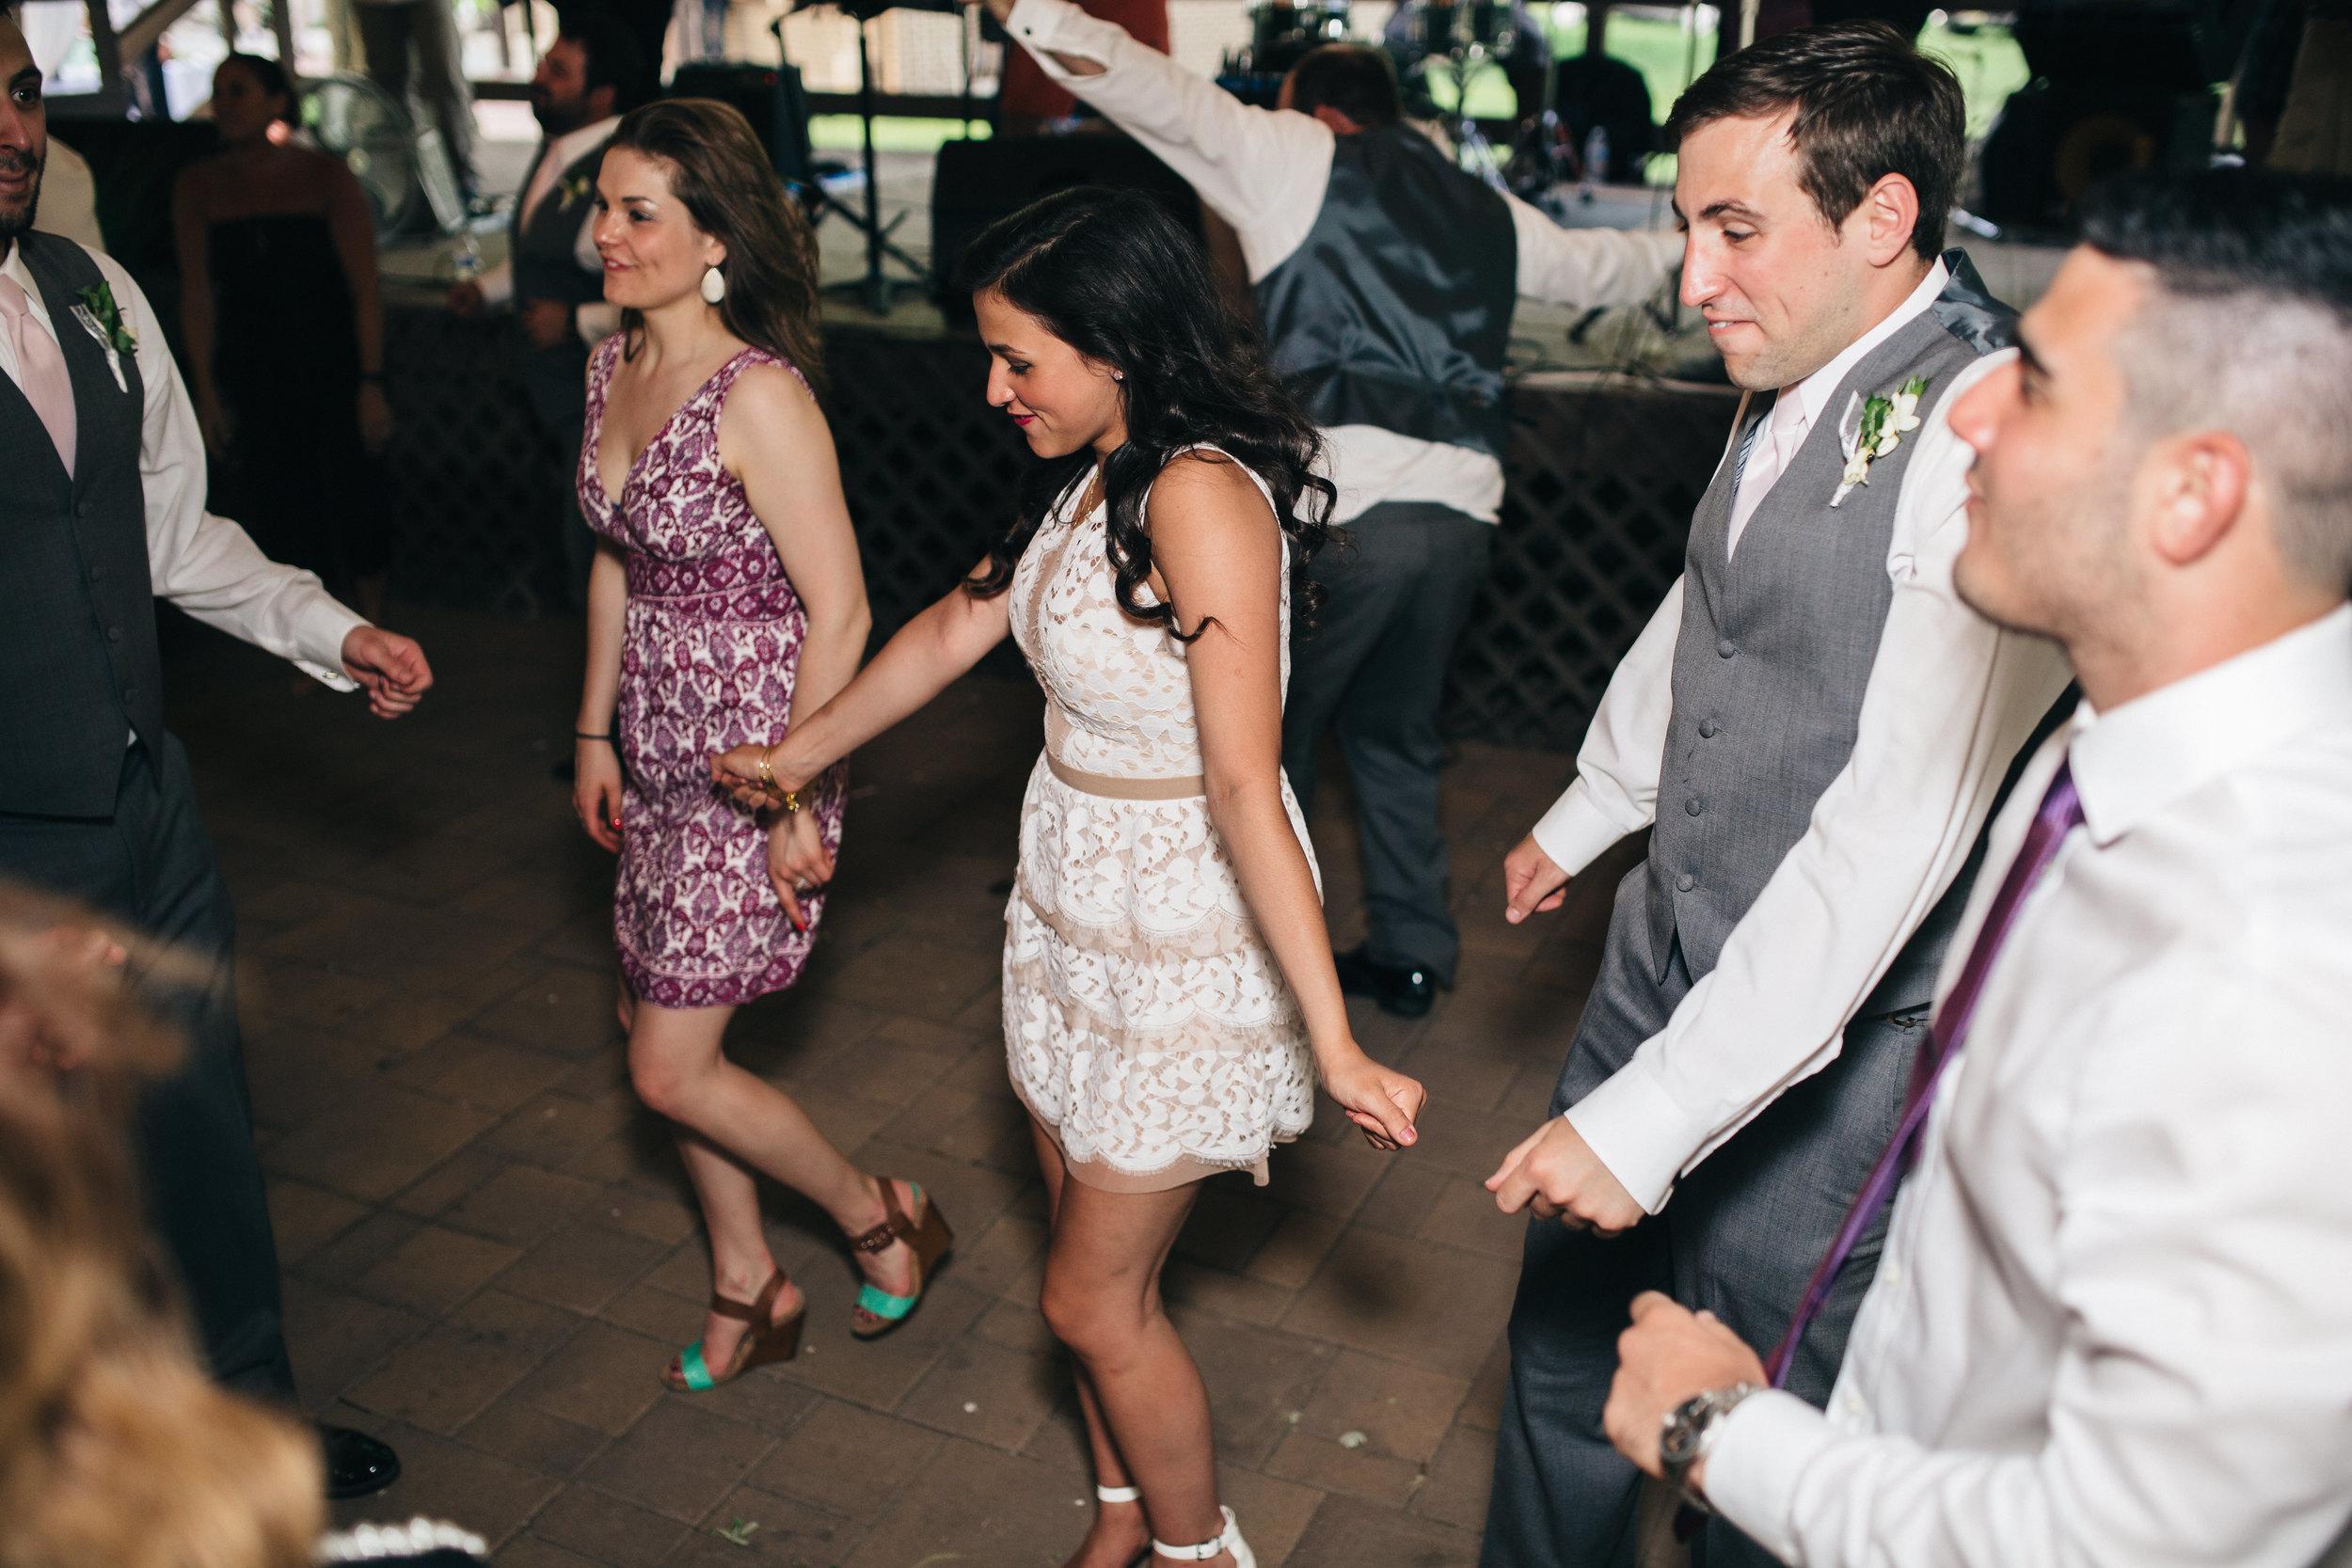 Wedding guests dancing to wedding band at reception.